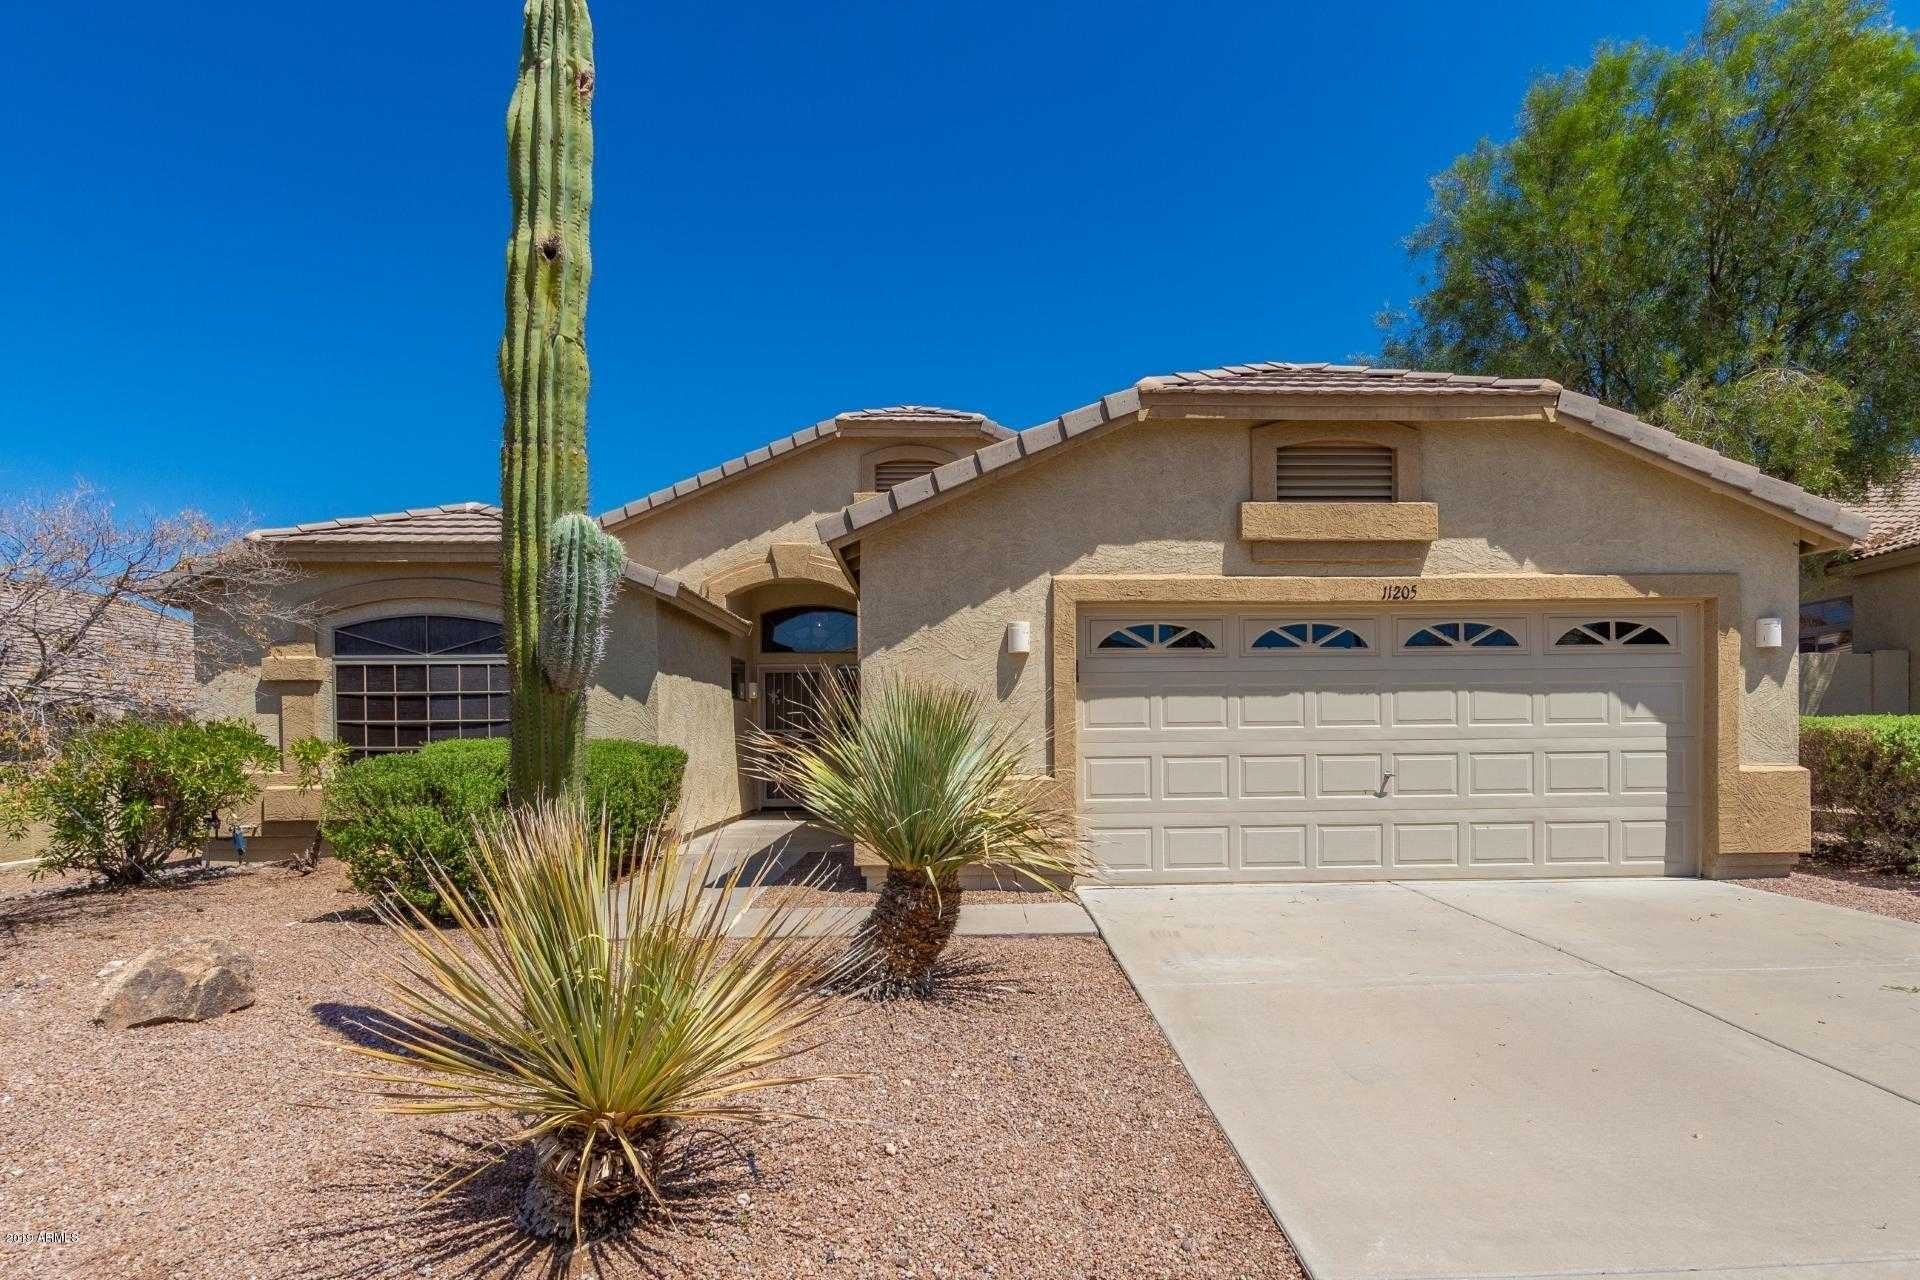 $262,500 - 3Br/2Ba - Home for Sale in Estrella Parcel 56a, Goodyear